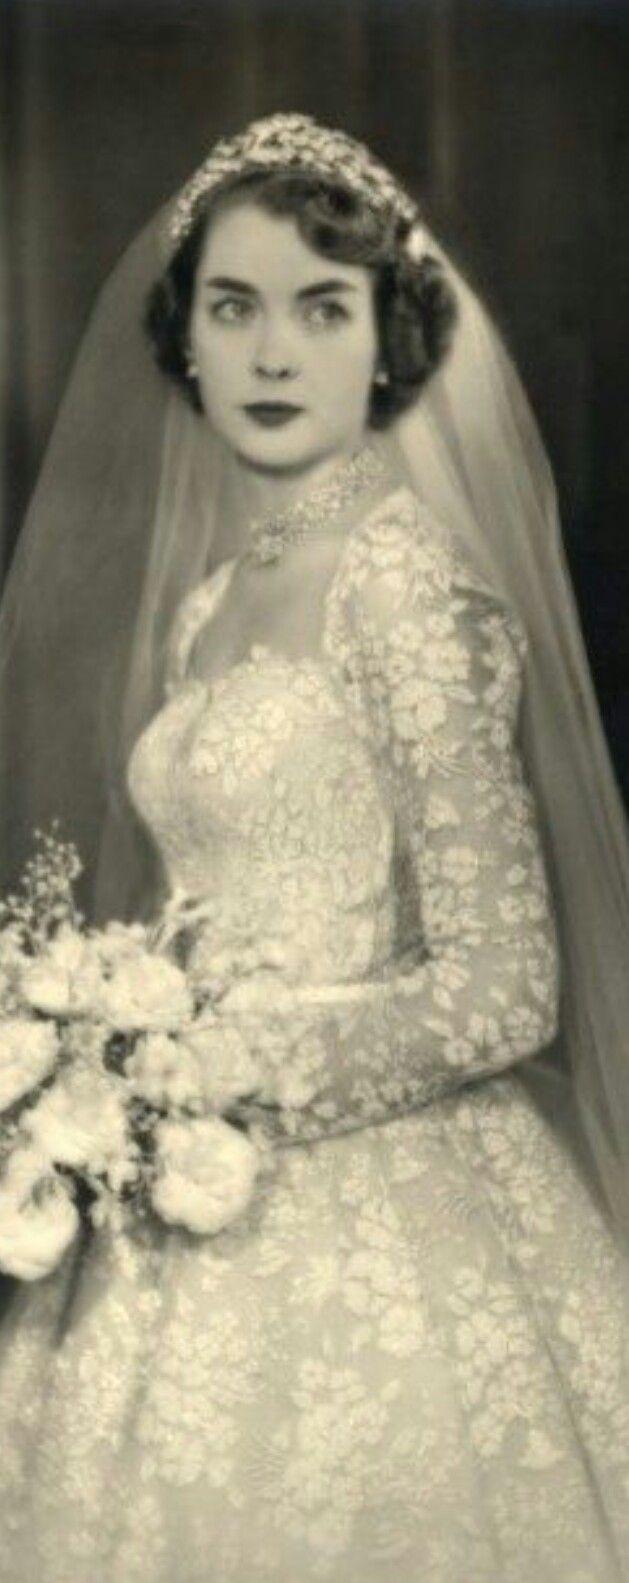 Pin by Cheryl Lindsey on dresses  Pinterest  Vintage weddings